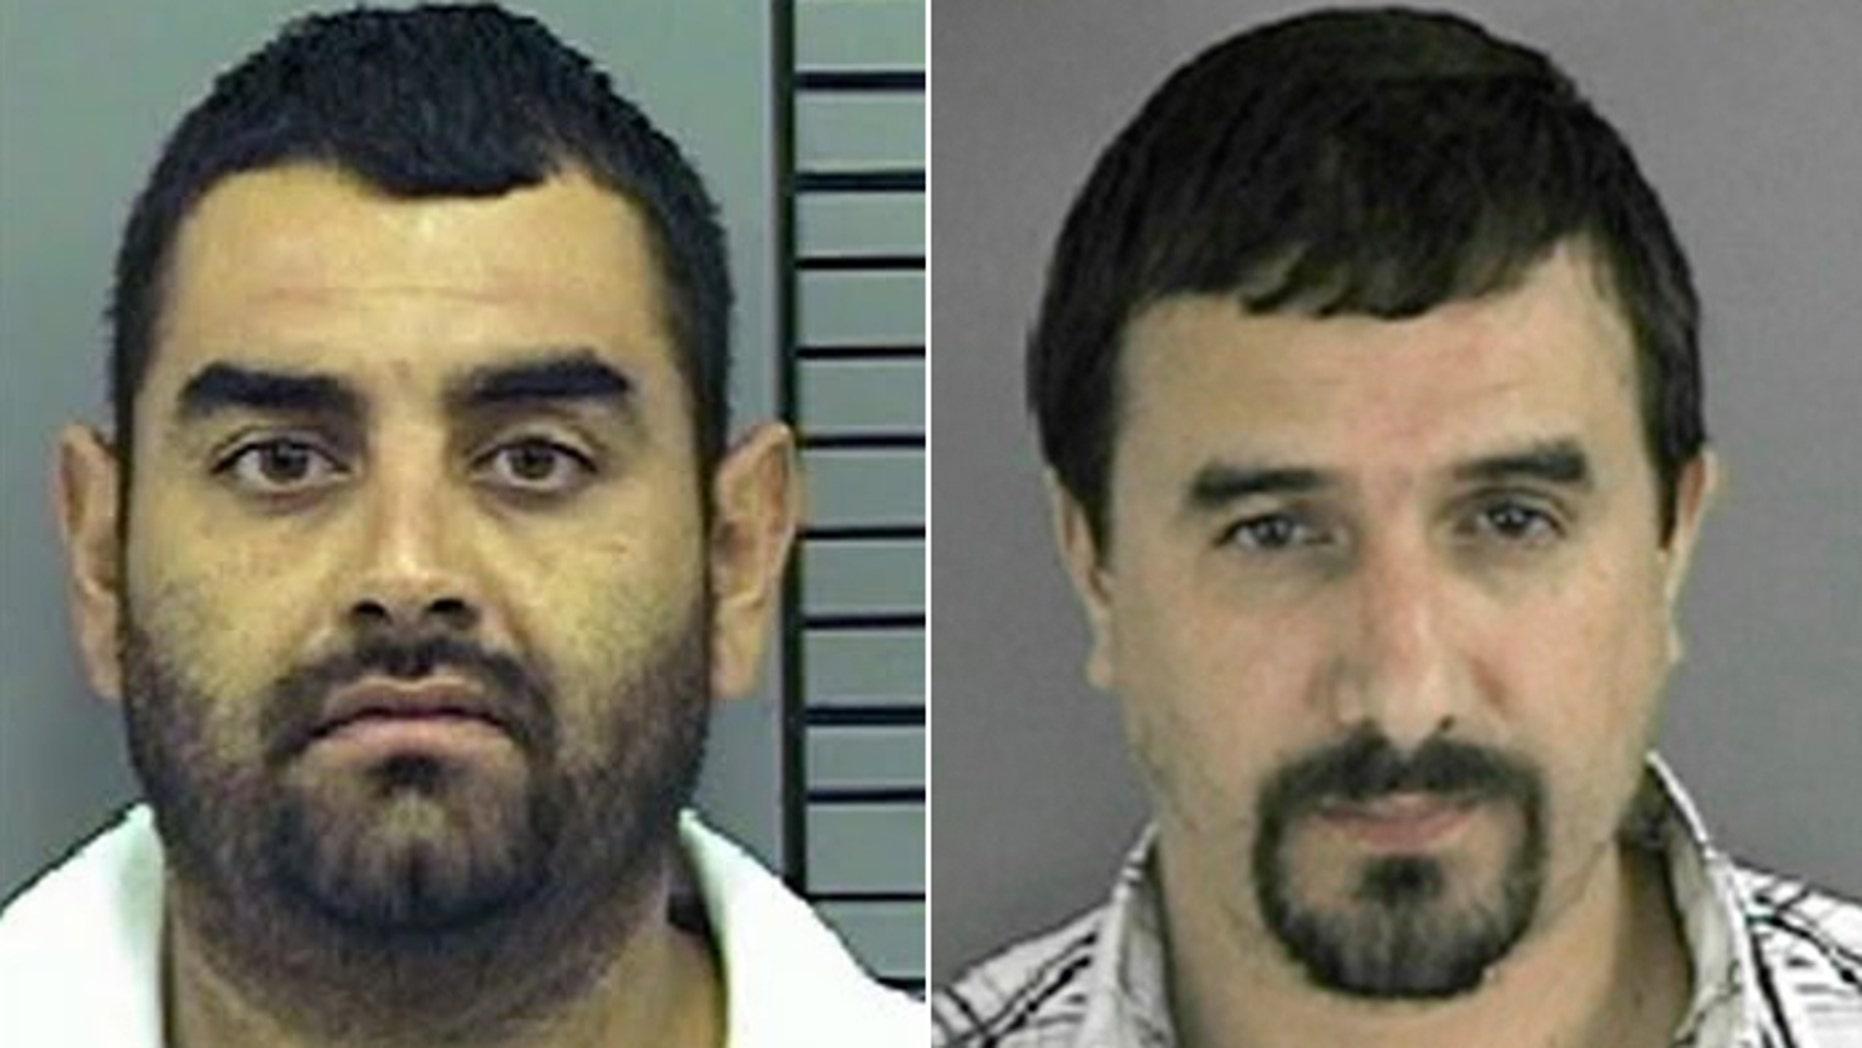 Ruben Rodriguez-Dorado, (l.) and Jose Daniel Gonzalez-Galeana (r.), were both ICE informants and drug cartal members when Rodriguez-Dorado allegedly put a hit on Gonzalez-Galeana. (El Paso Police Department, Crimestoppers)